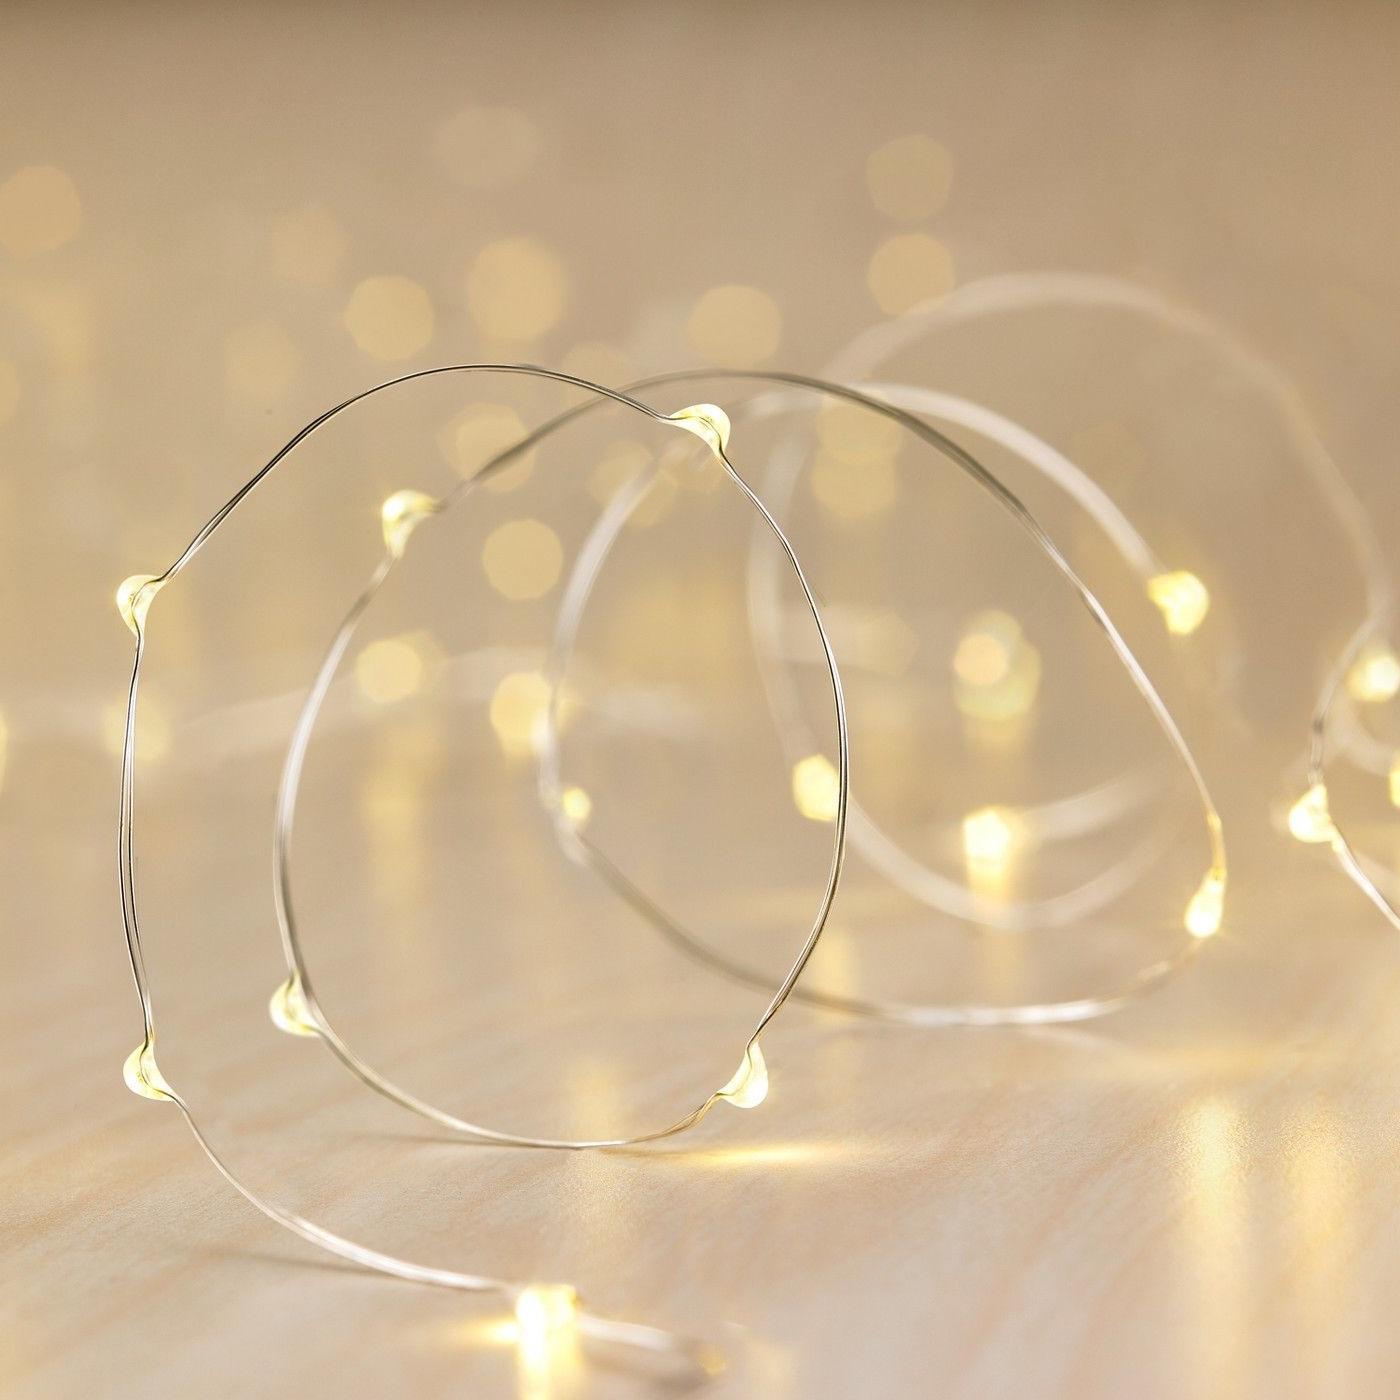 Philips Dewdrop LED Fairy Lights Warm